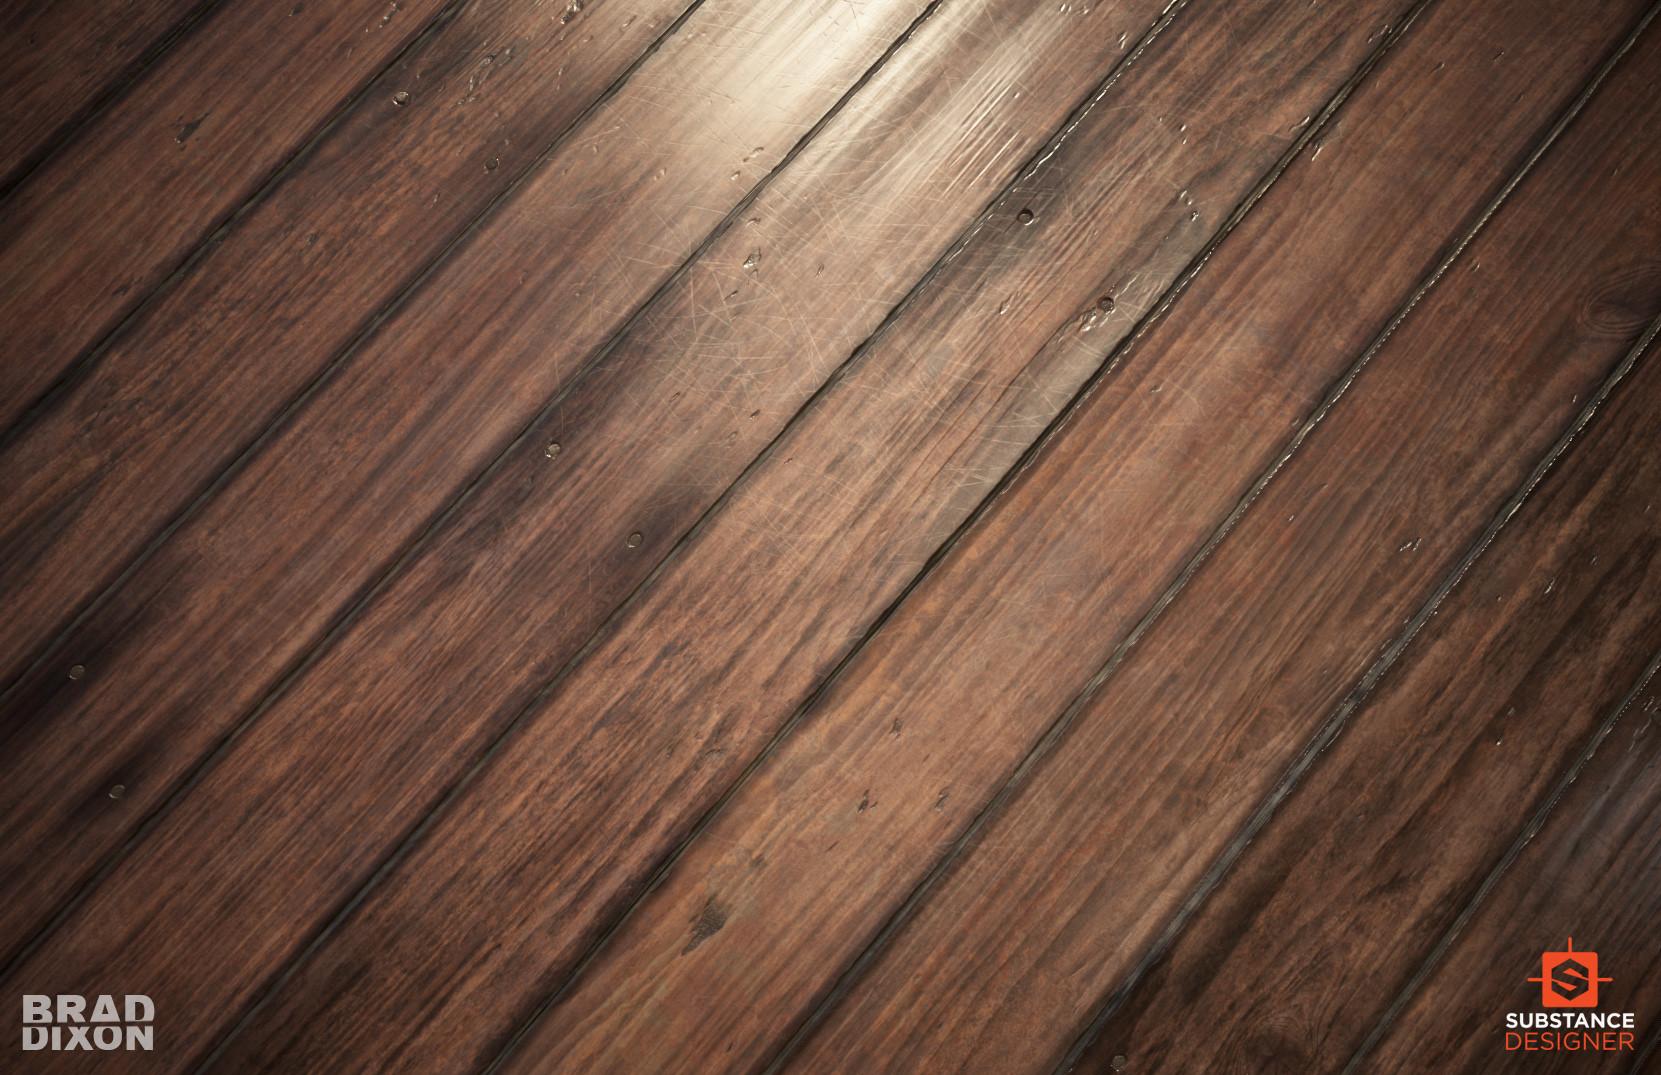 ArtStation - Age-able Varnished Wood, Brad Dixon